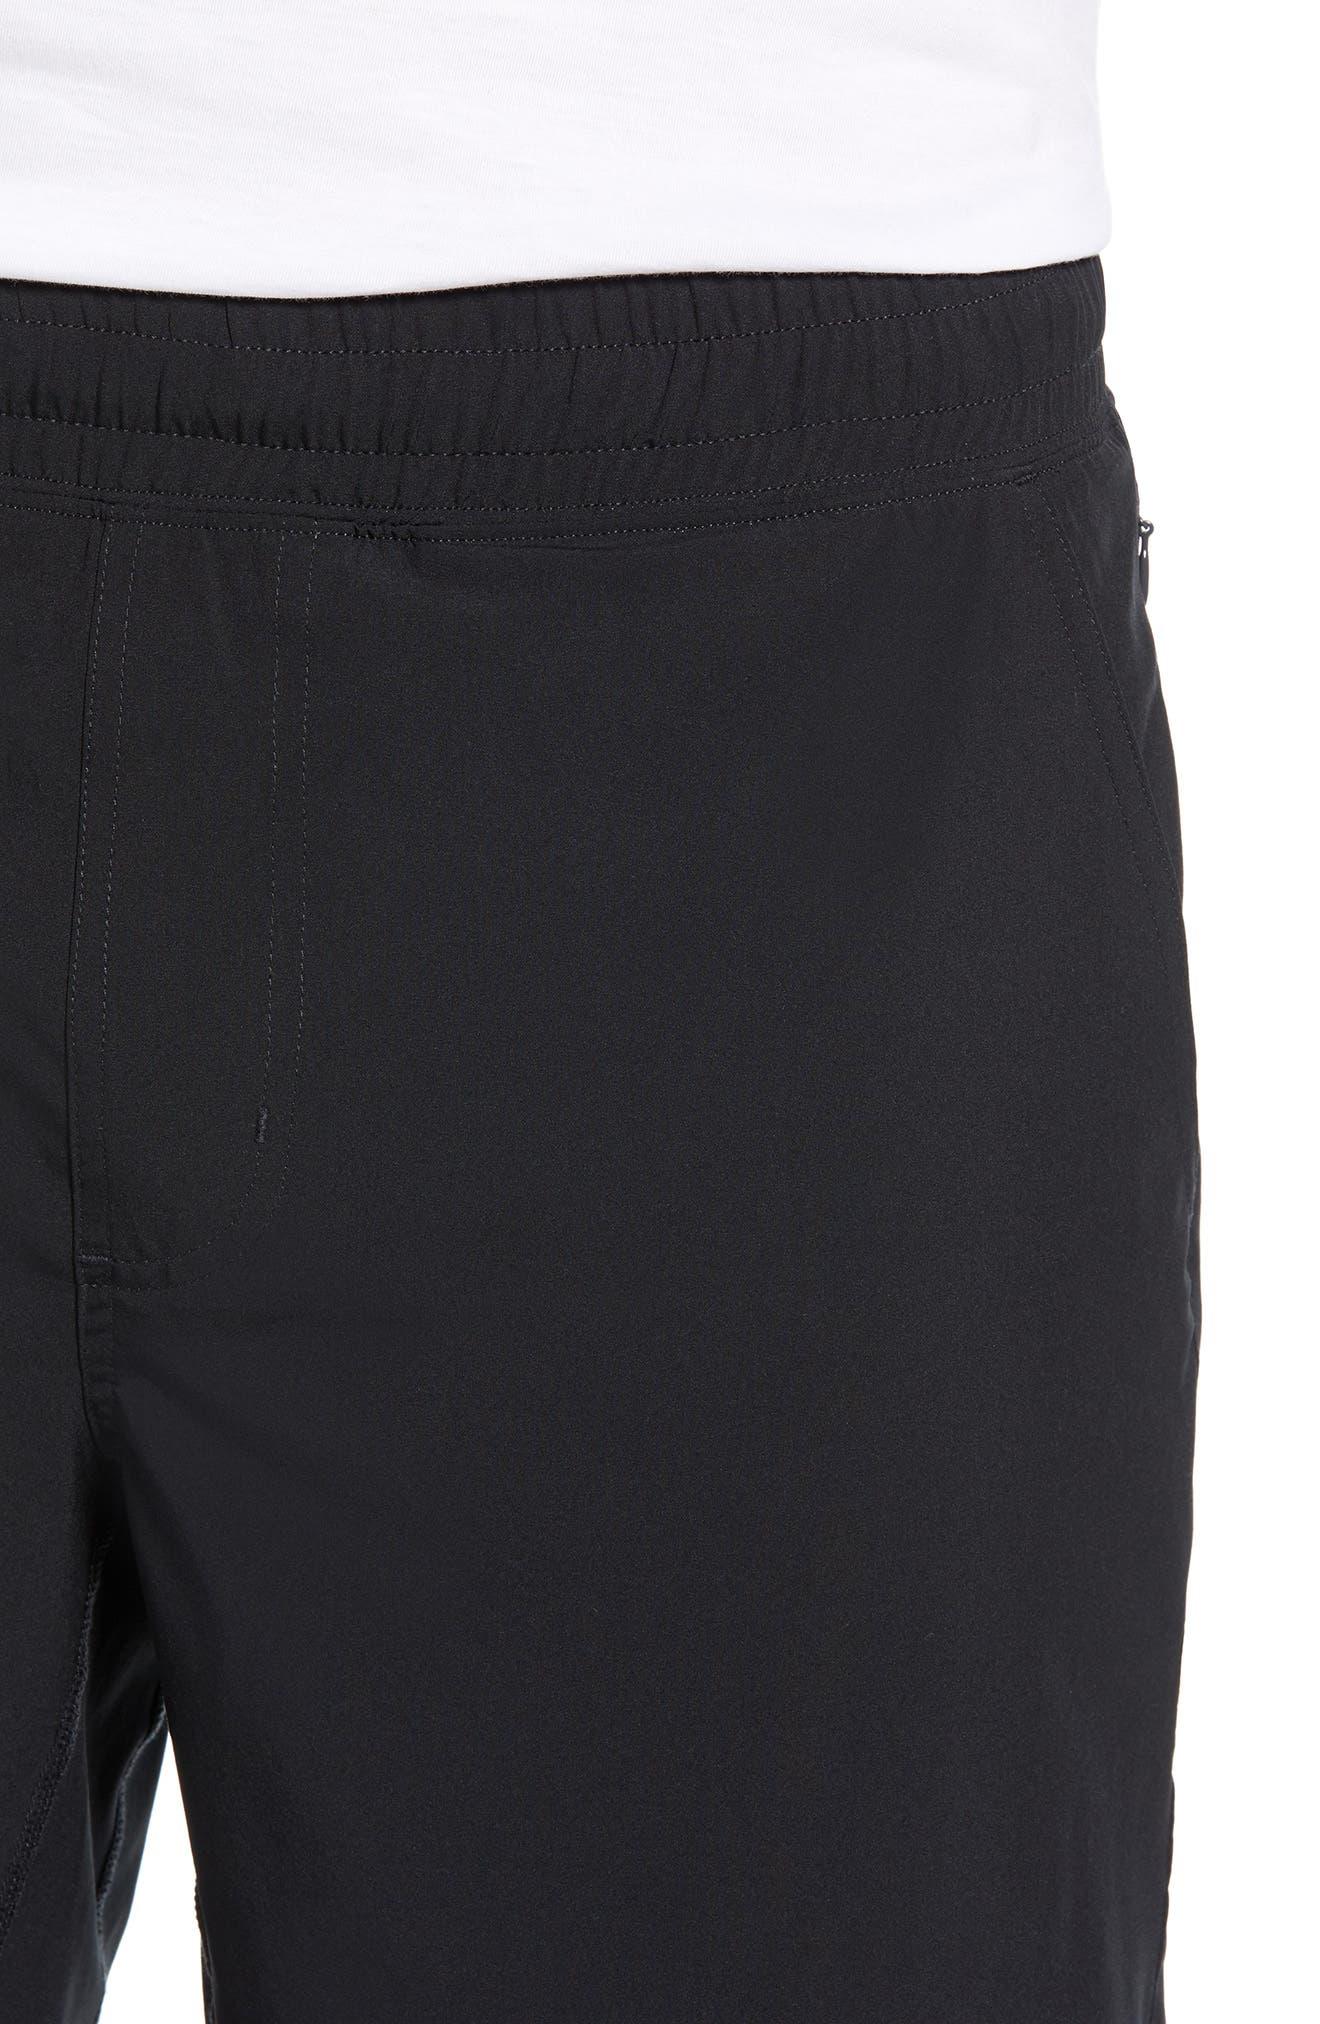 RHONE, Mako Lined Shorts, Alternate thumbnail 4, color, BLACK